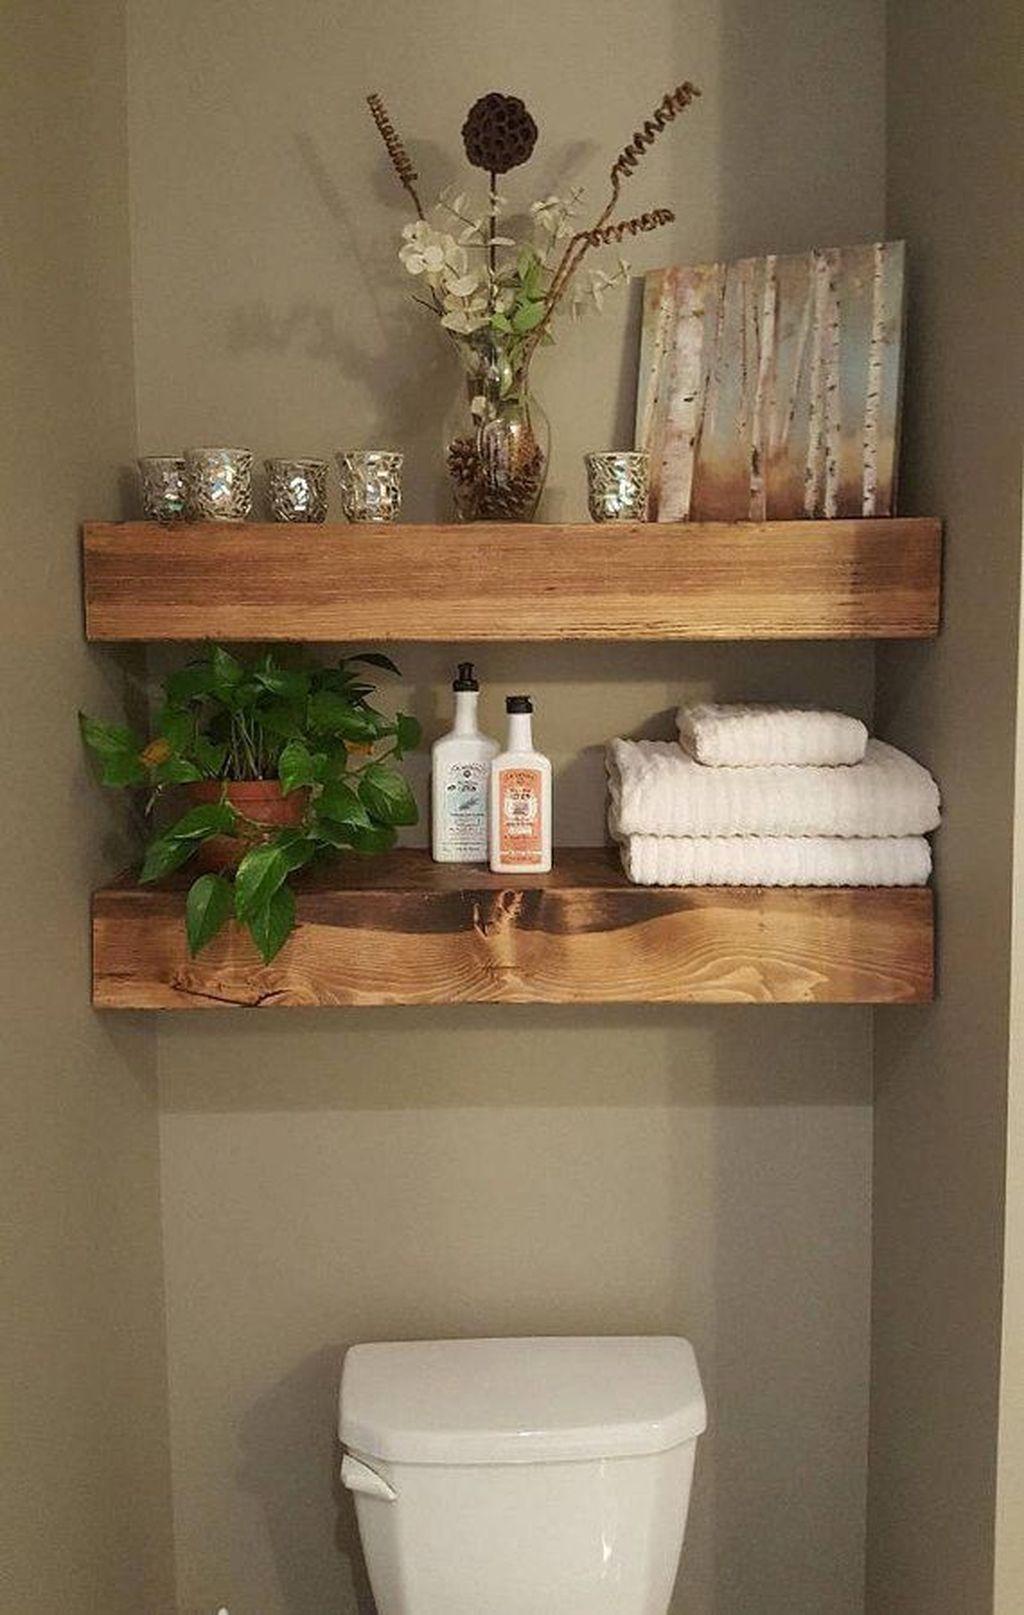 Amazing Bathroom Storage Design Ideas For Small Space 23